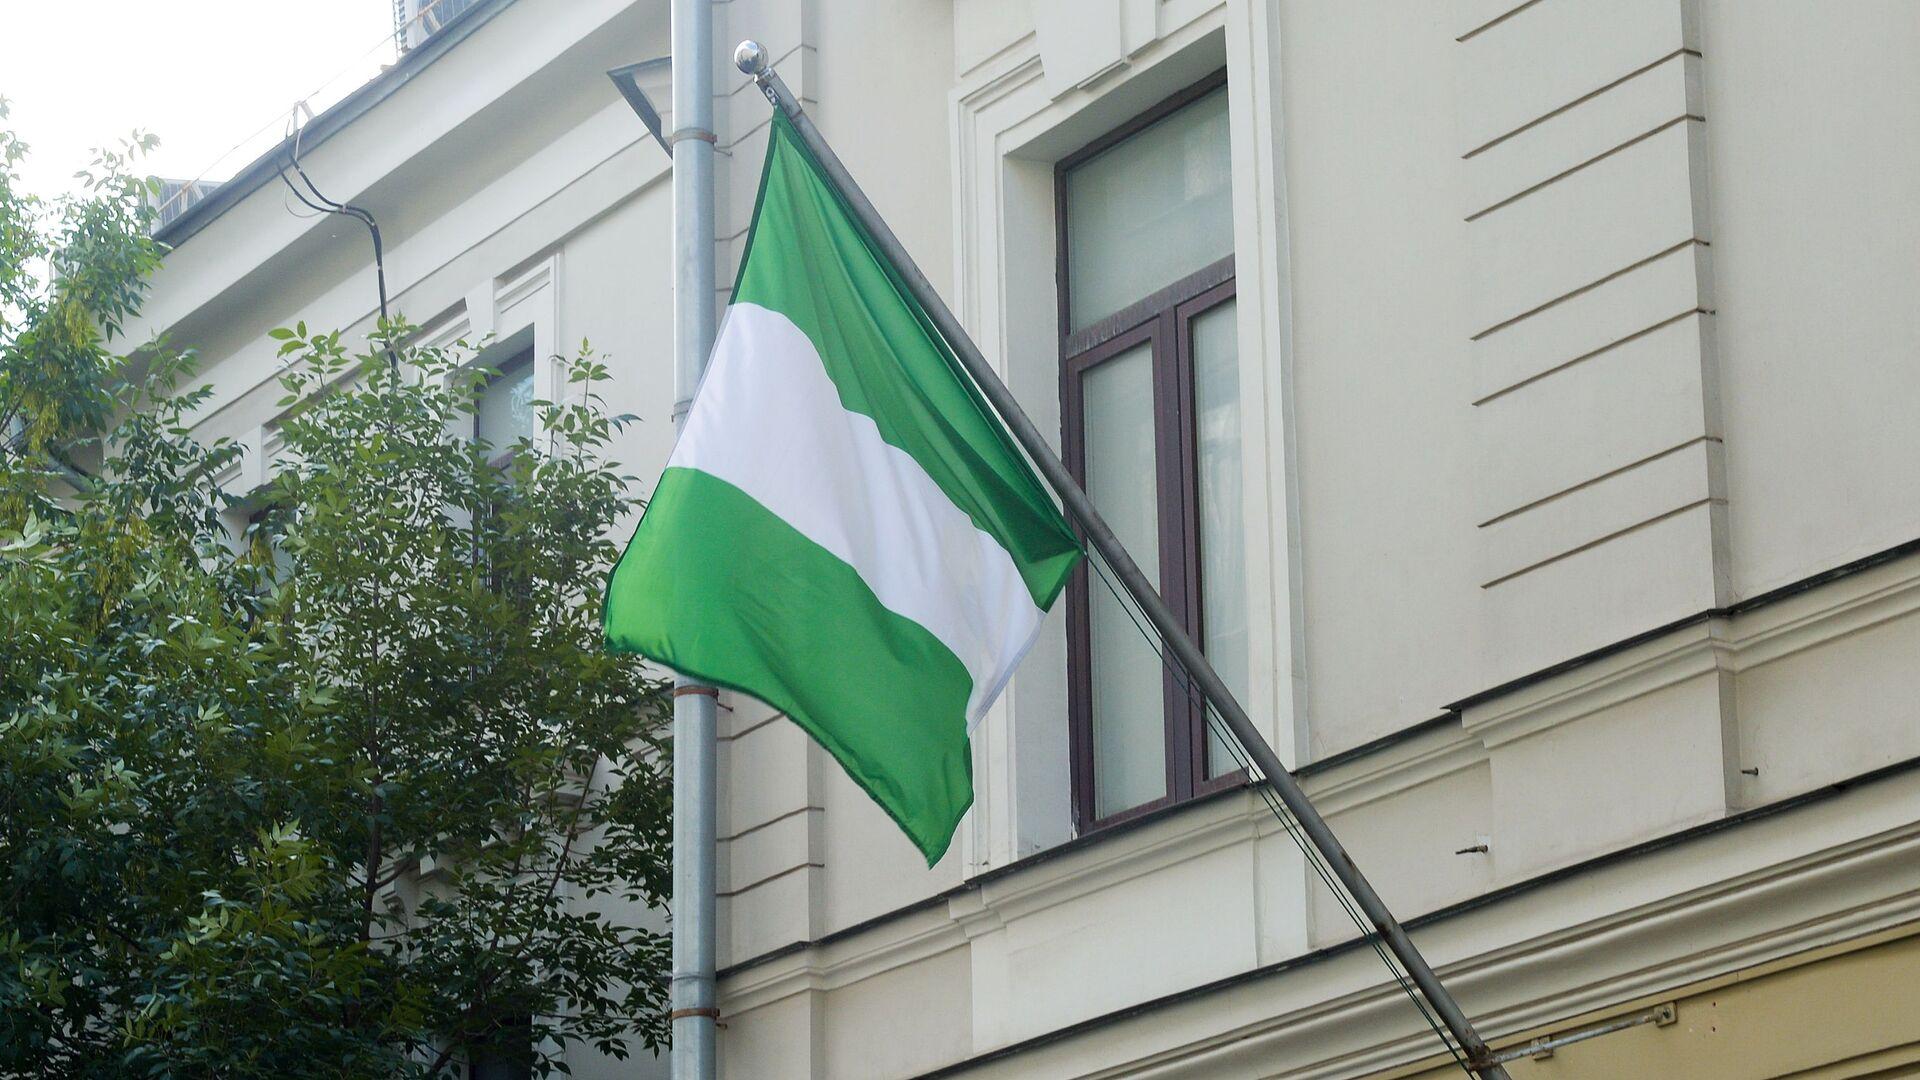 La bandiera di Nigeria - Sputnik Italia, 1920, 21.05.2021